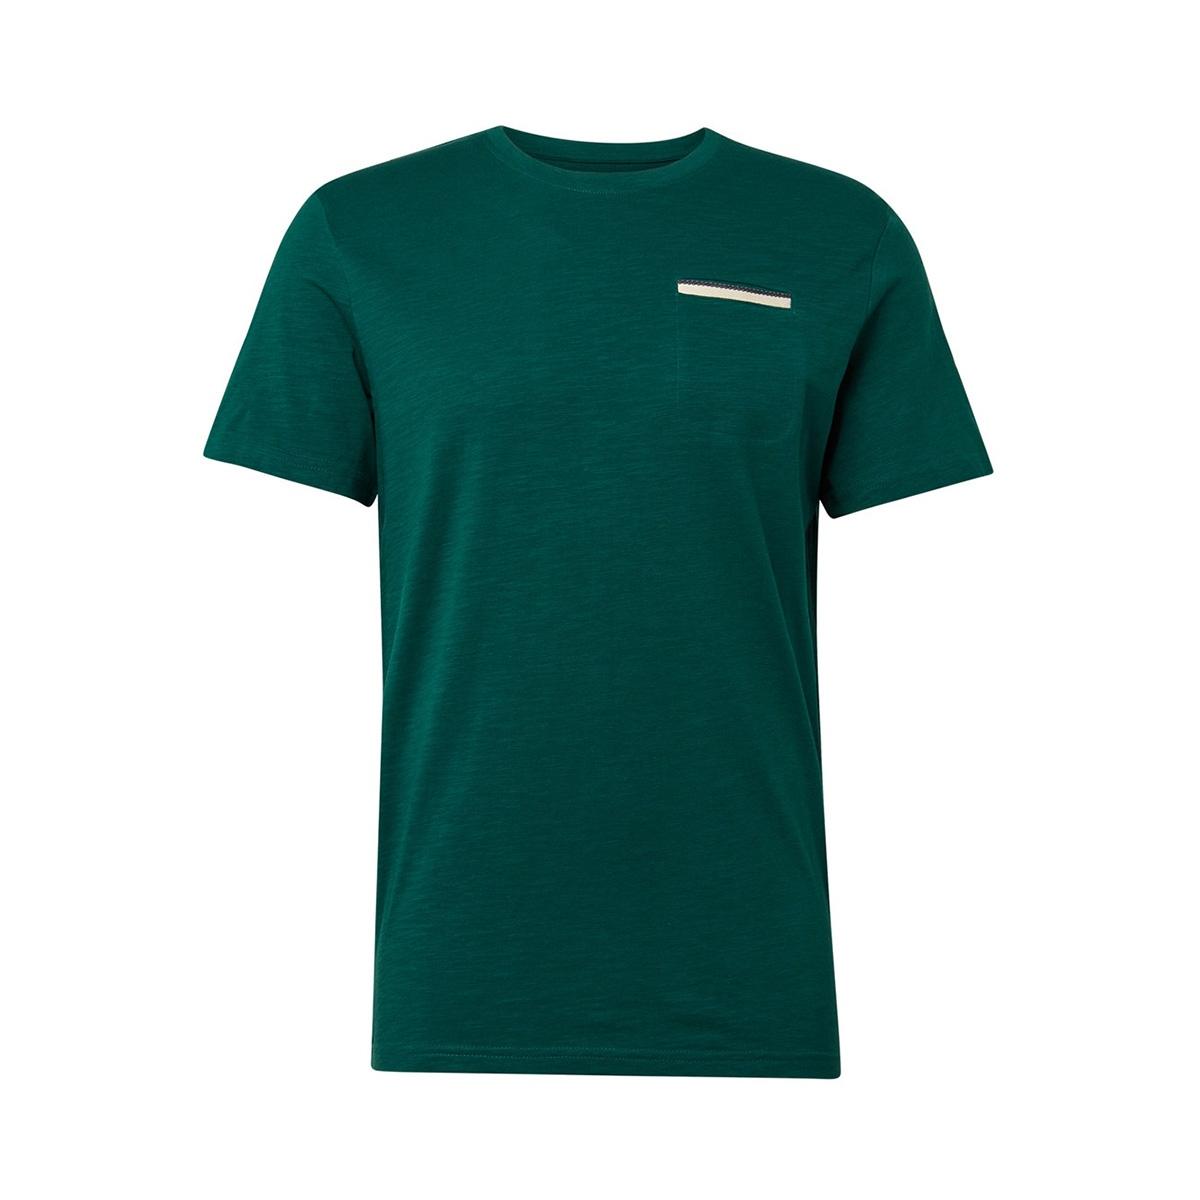 t shirt met borstzak 1012834xx10 tom tailor t-shirt 10413